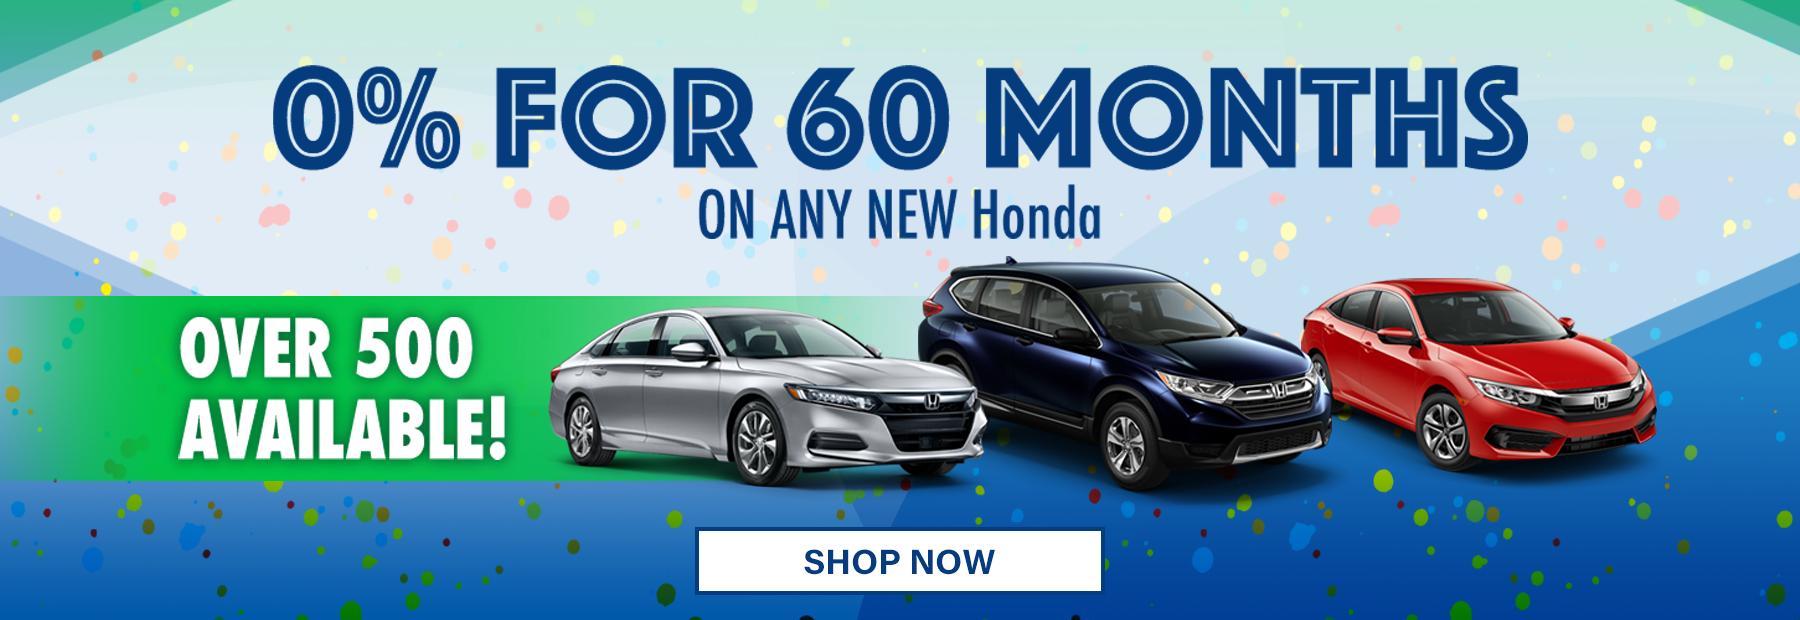 zero-percent-financing-on-honda-vehicles